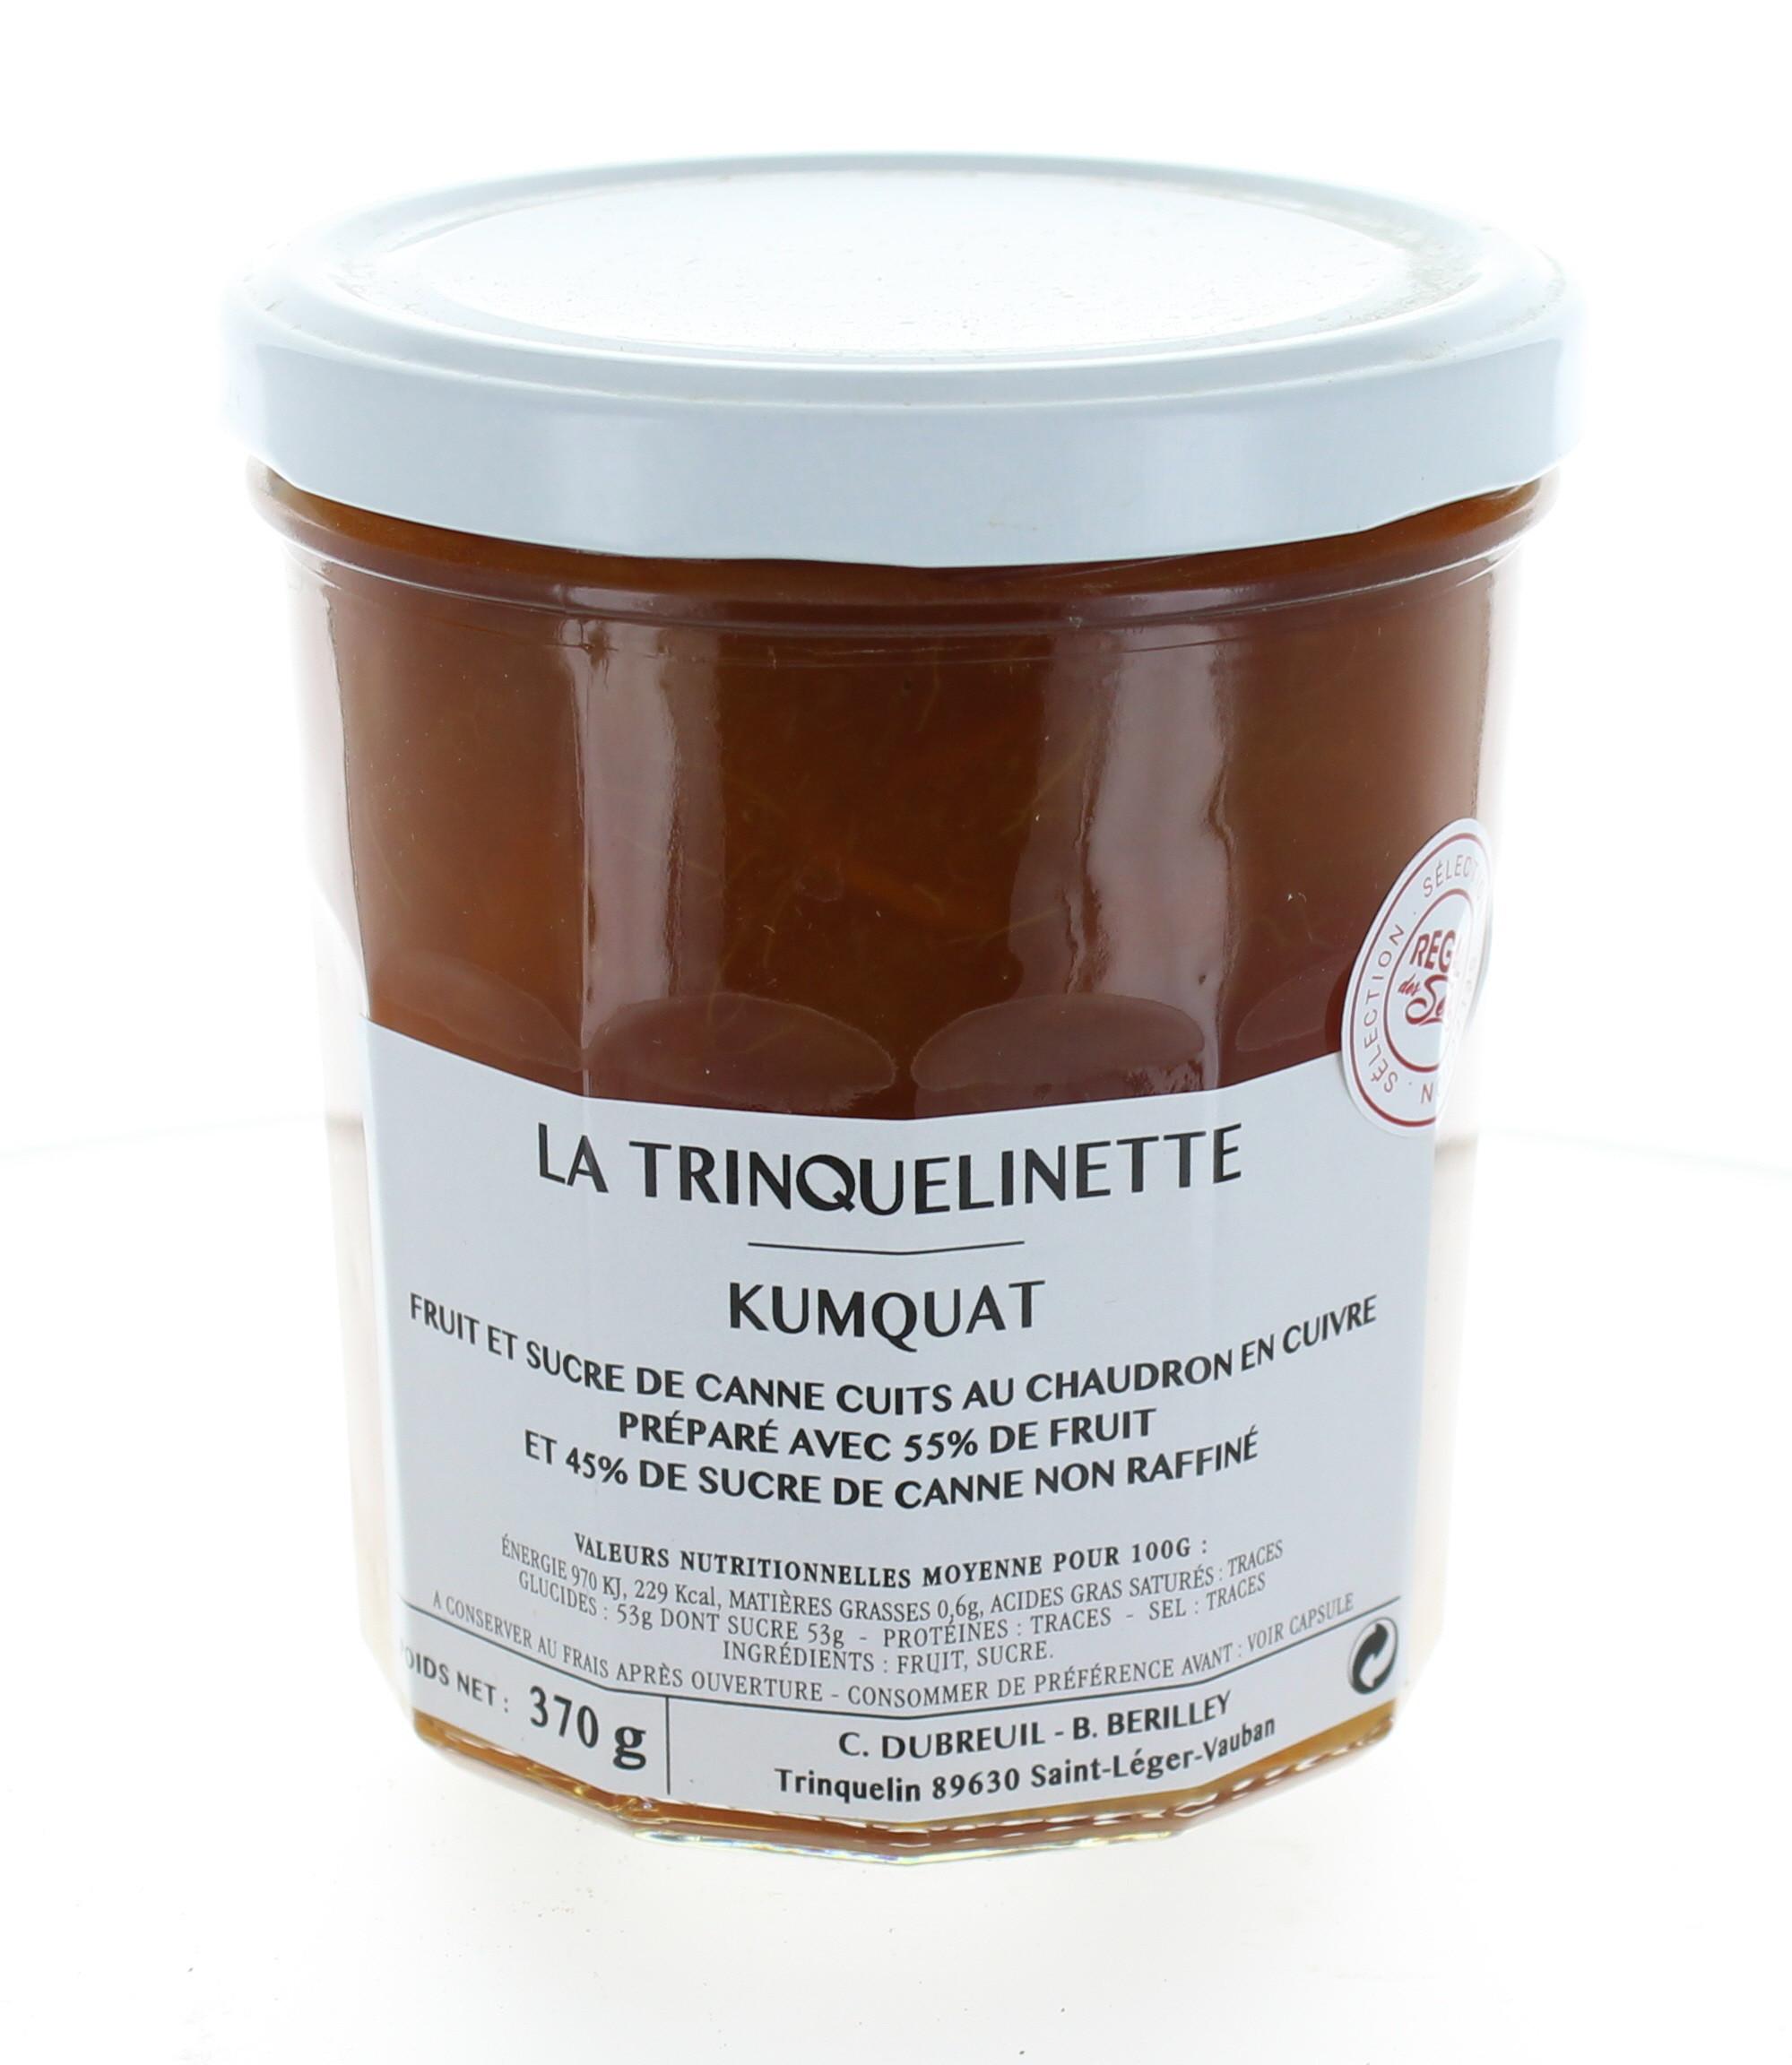 Confiture de Kumquat - La trinquelinette